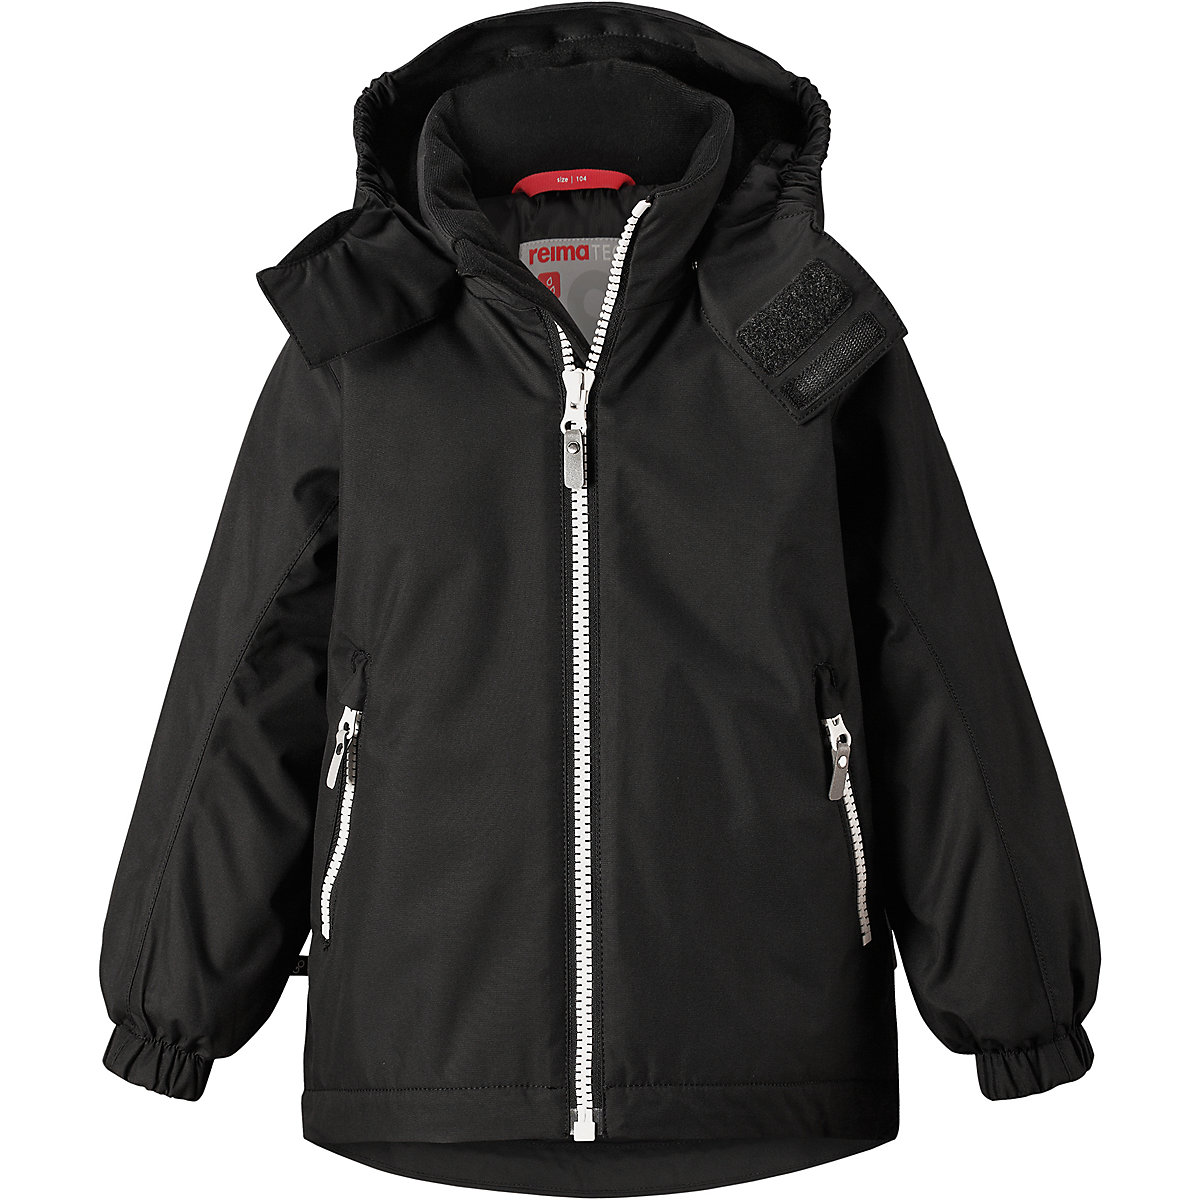 REIMA Jackets & Coats 8689669 for boys baby clothing winter warm boy girl jacket Polyester pro biker motorcycle racing jacket men s motocross motorbike moto clothing waterproof windproof jaqueta